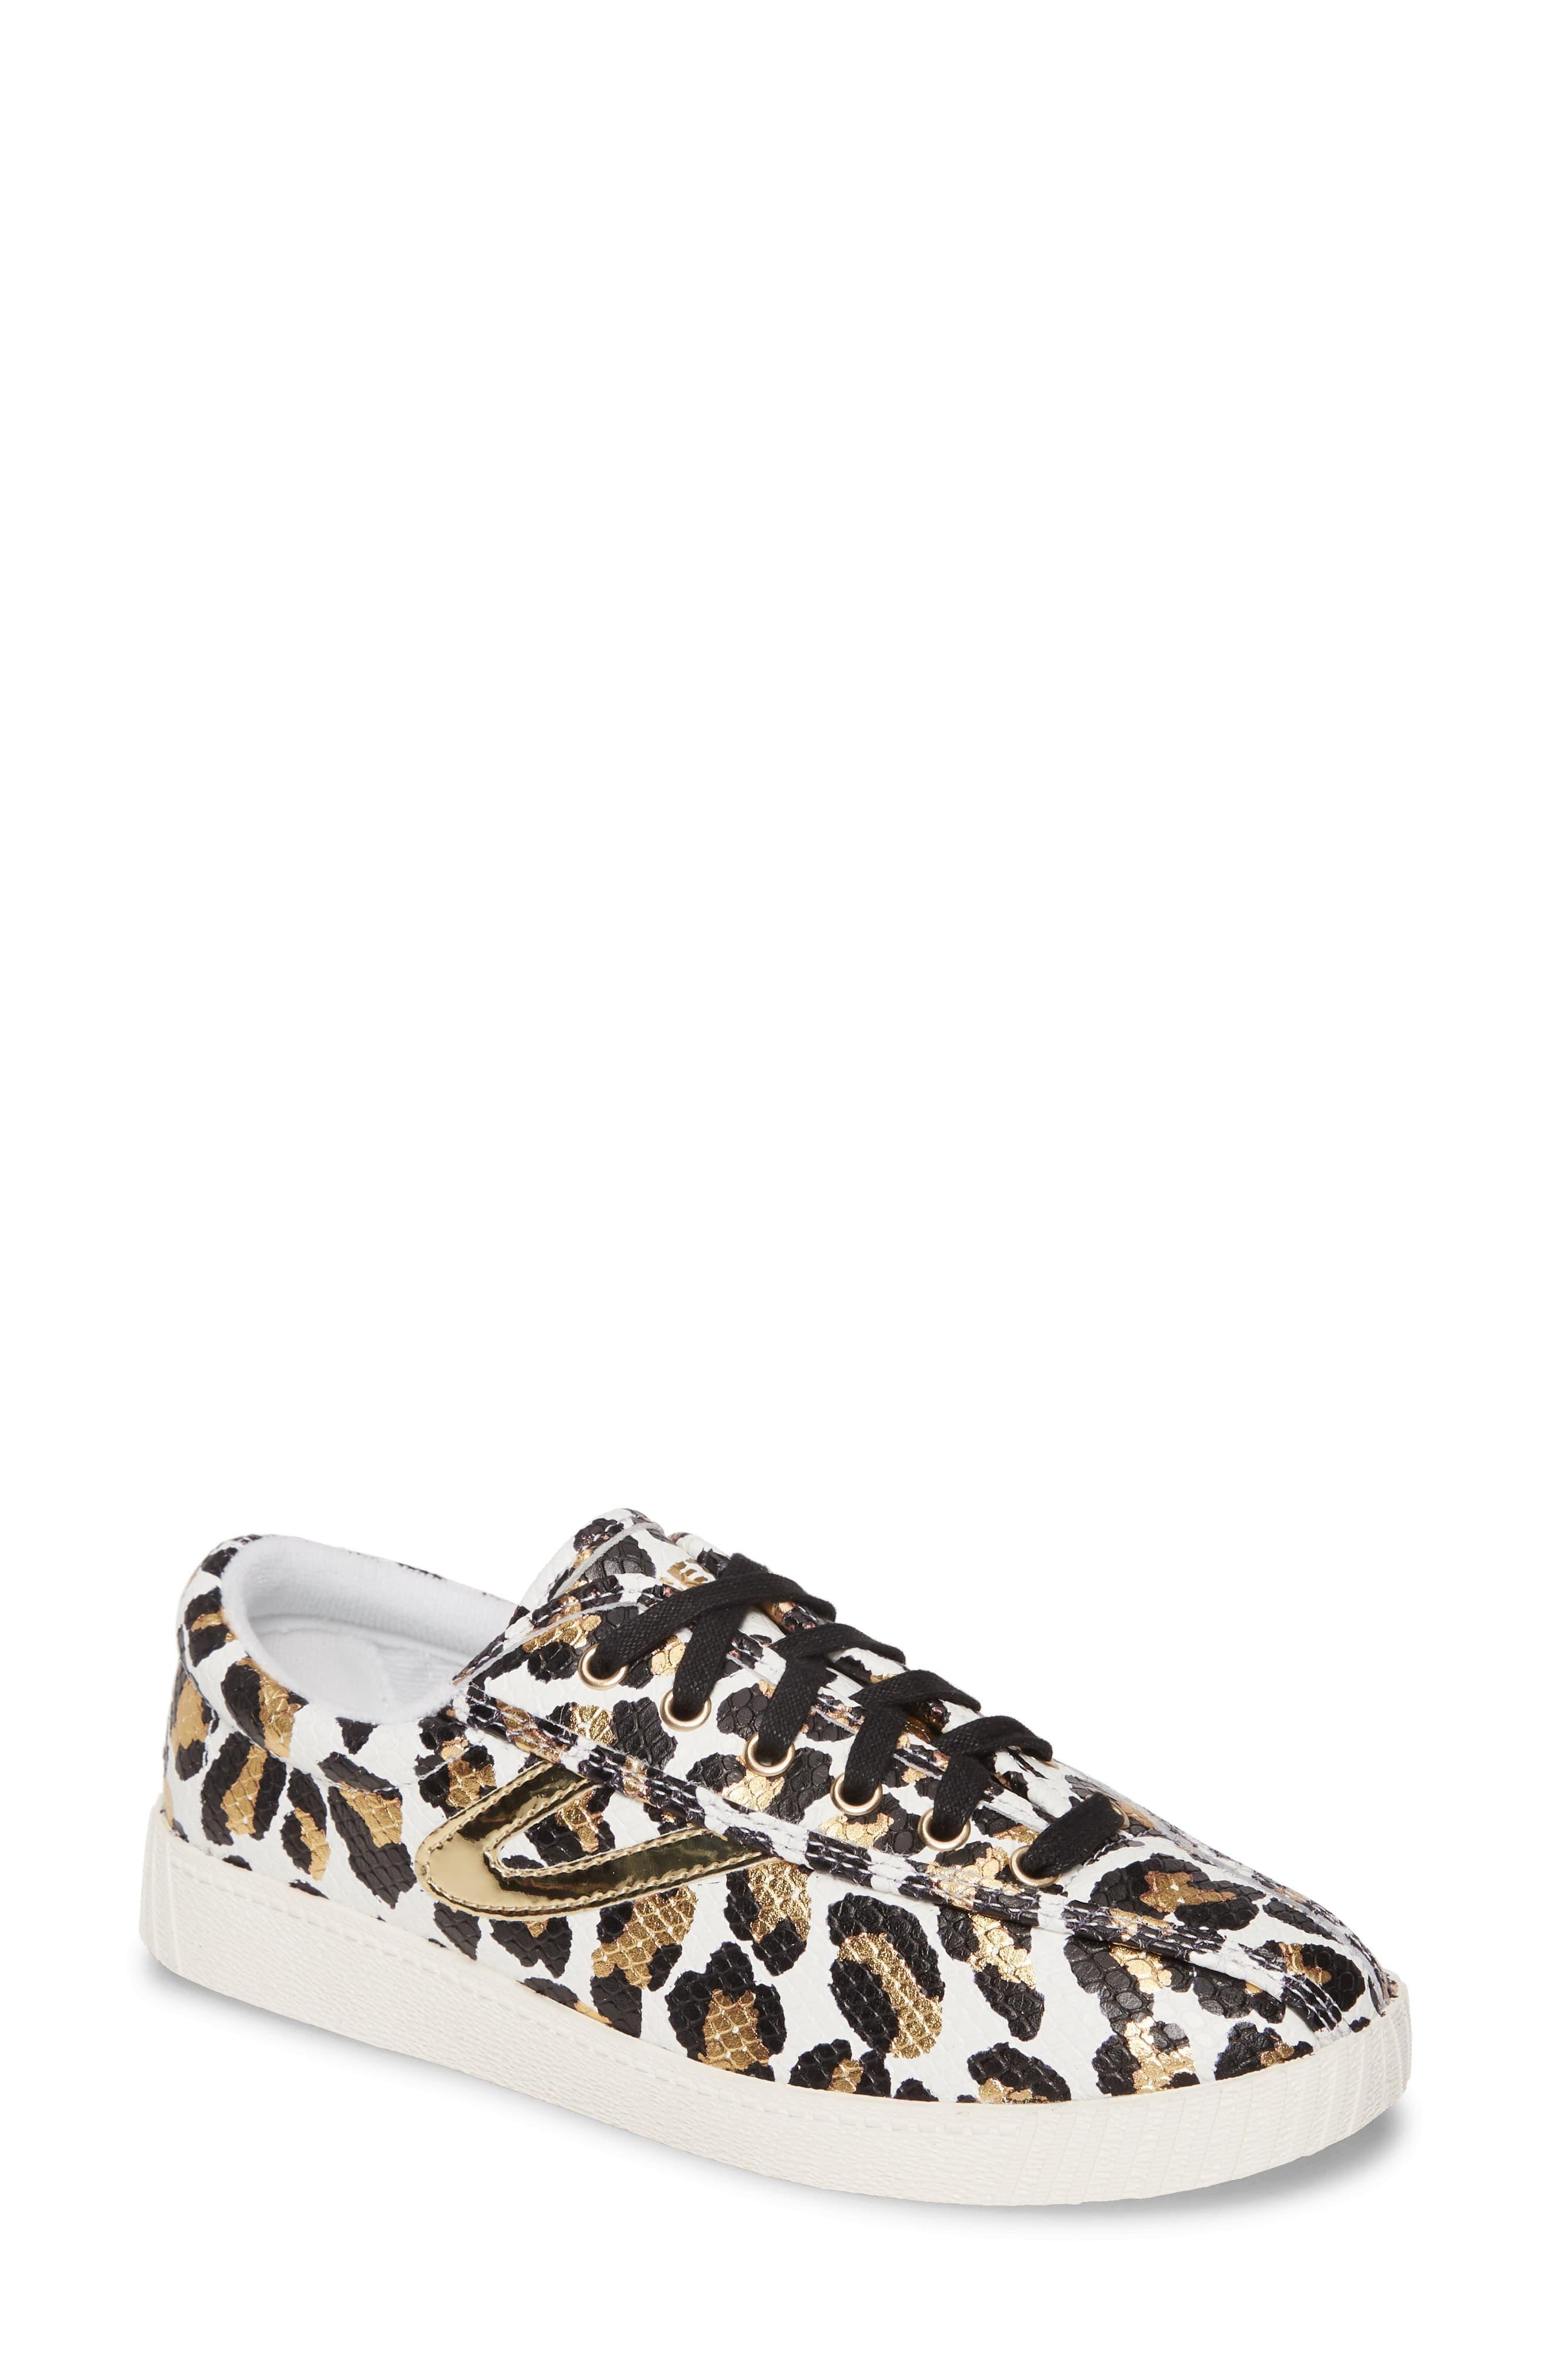 Women's Nylite 34 Plus Sneaker